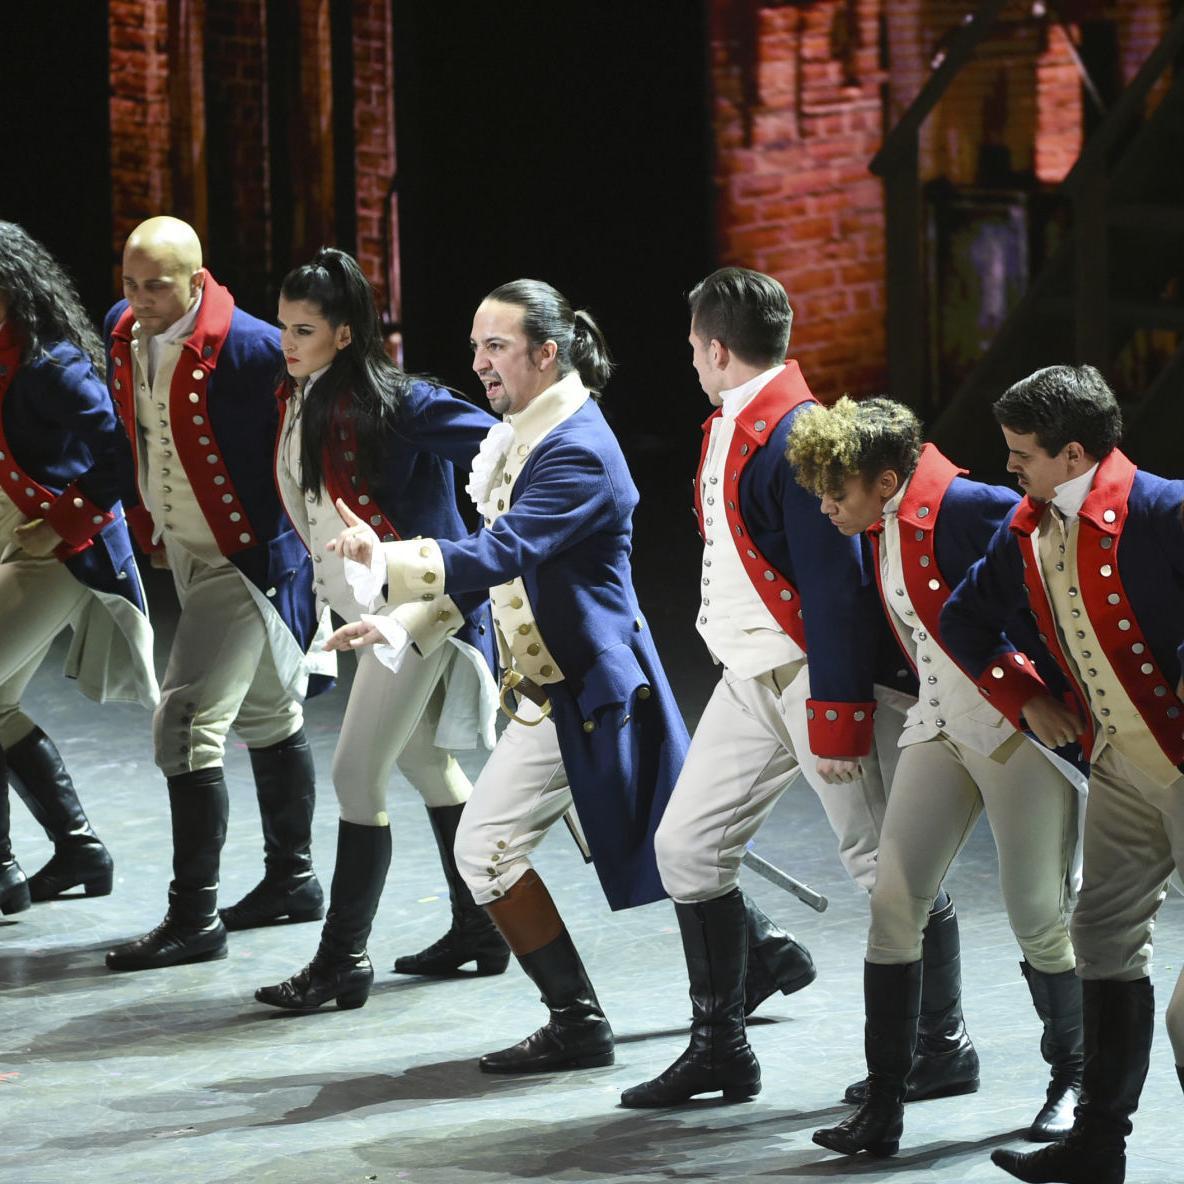 Historians: 'Hamilton' riddled with errors